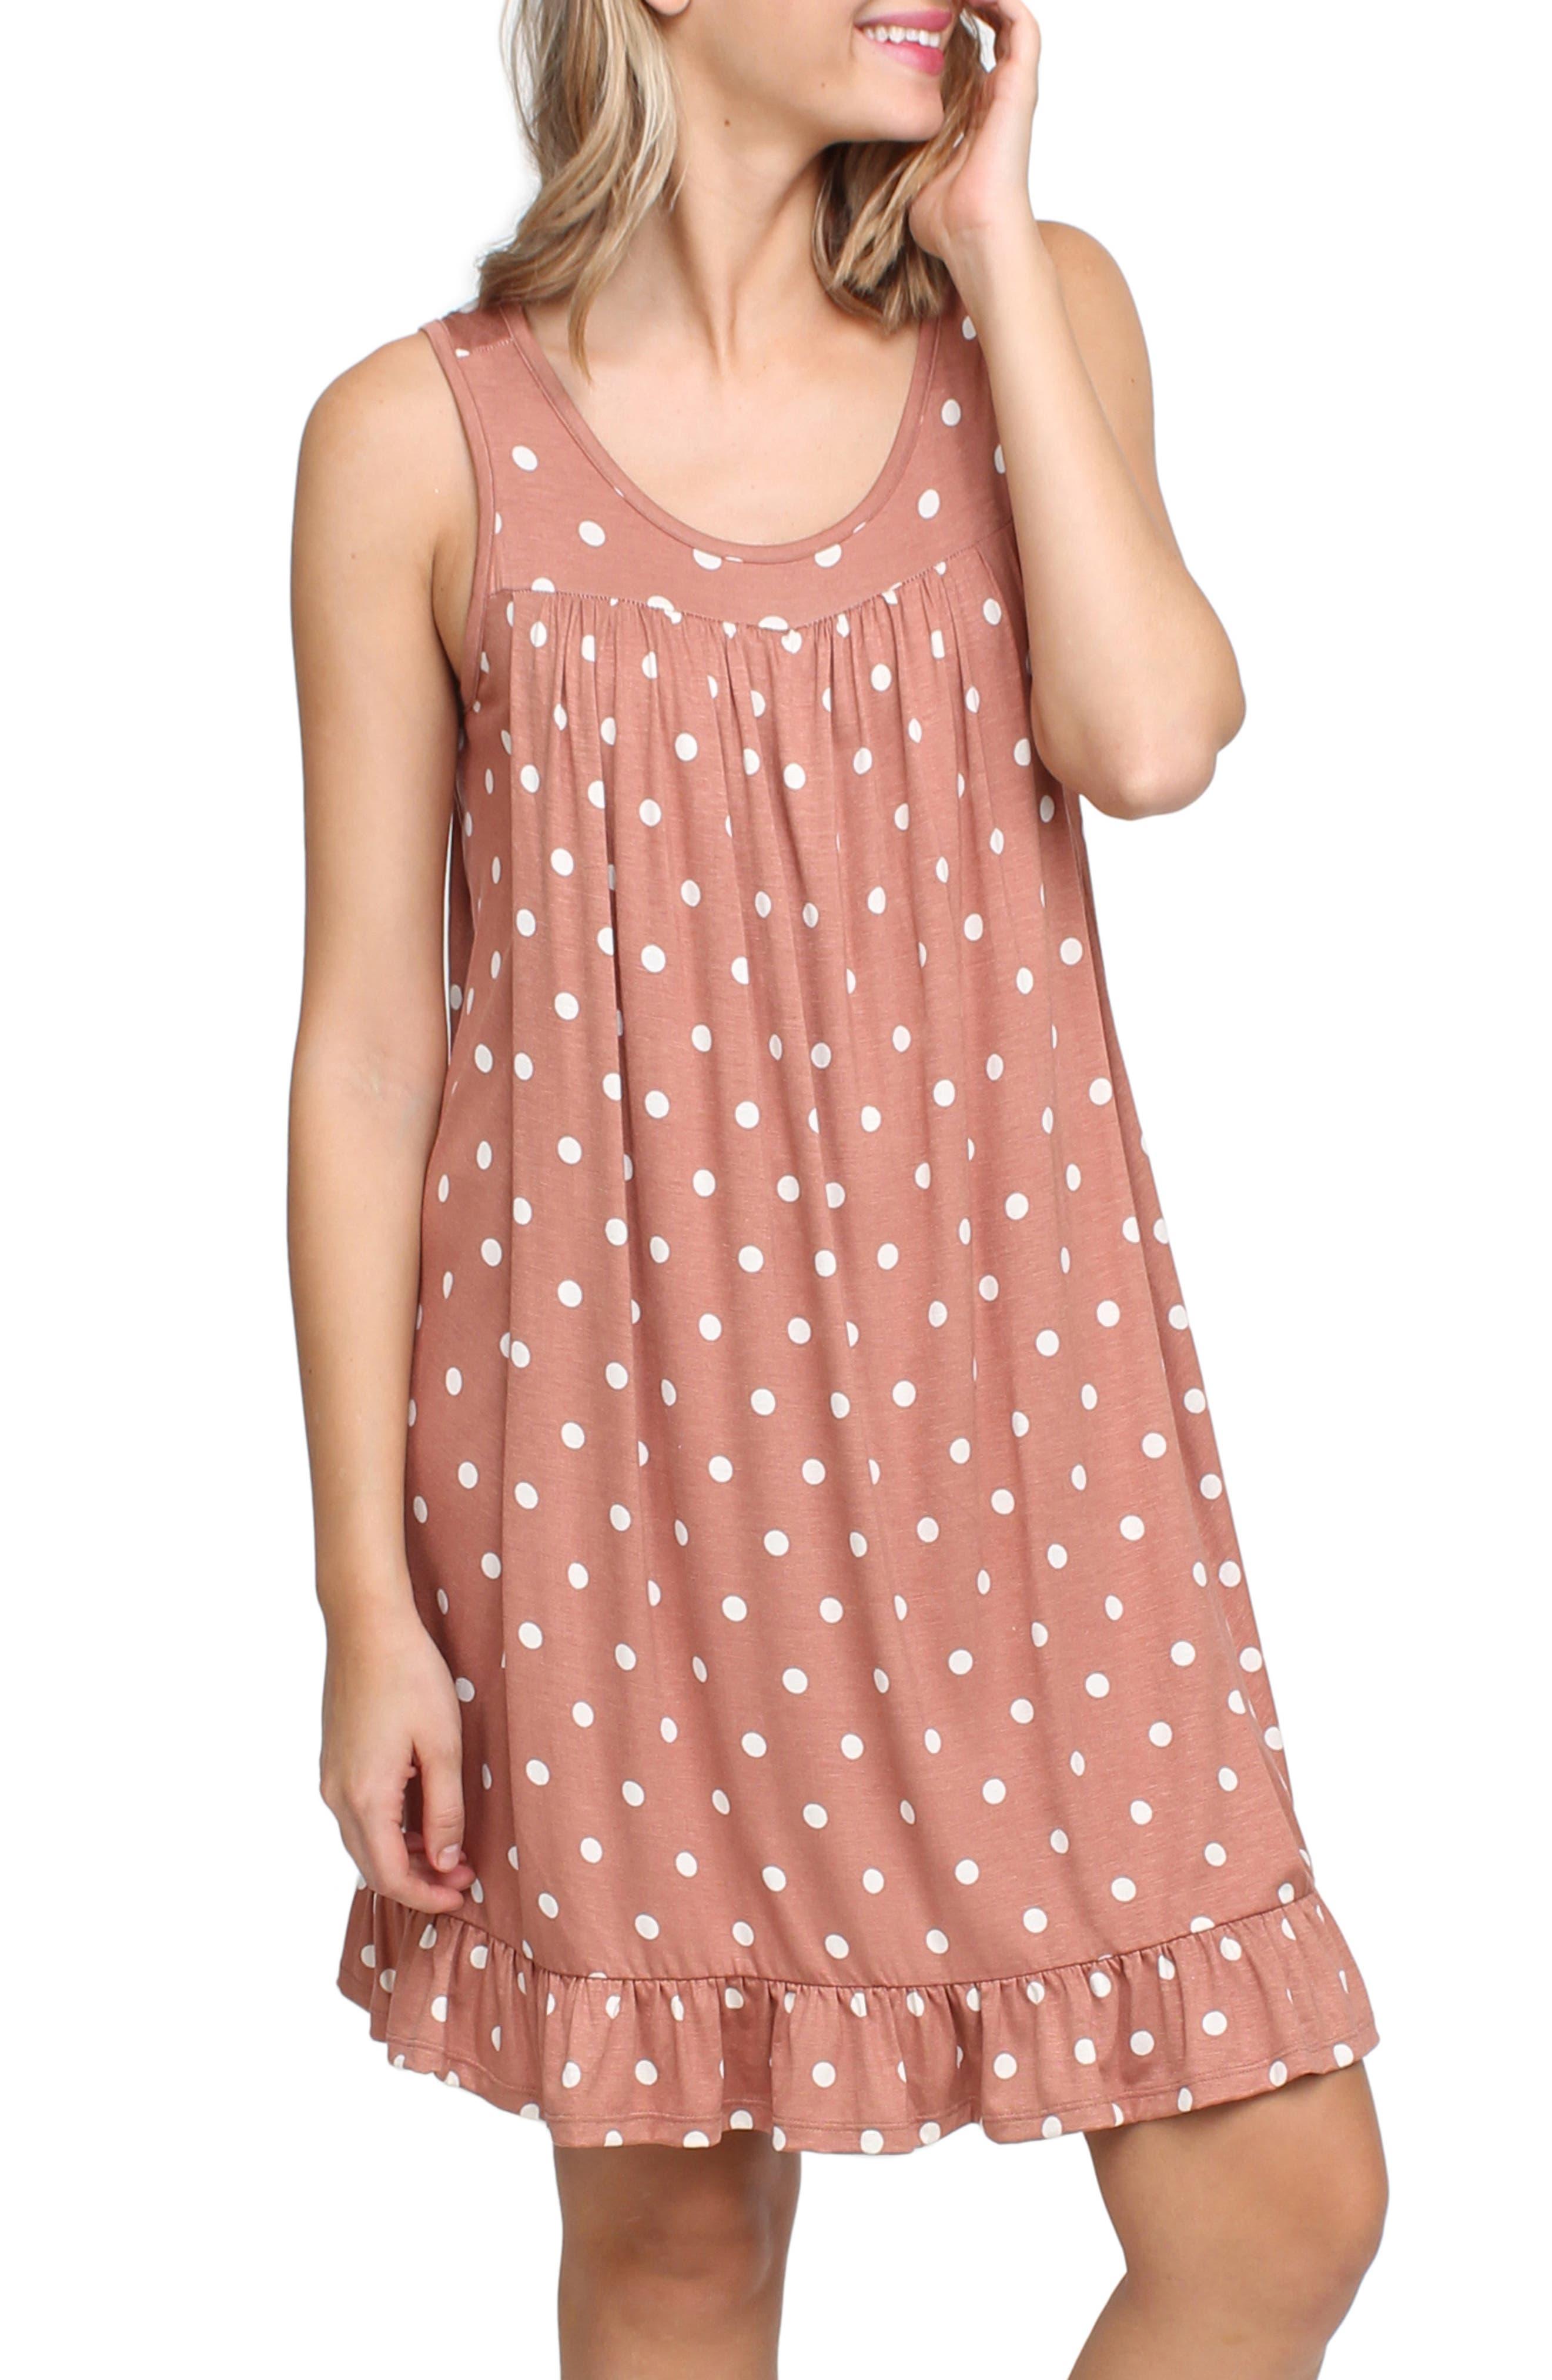 SAVI MOM Paris Maternity/Nursing Nightgown, Main, color, MAUVE POLKA DOT